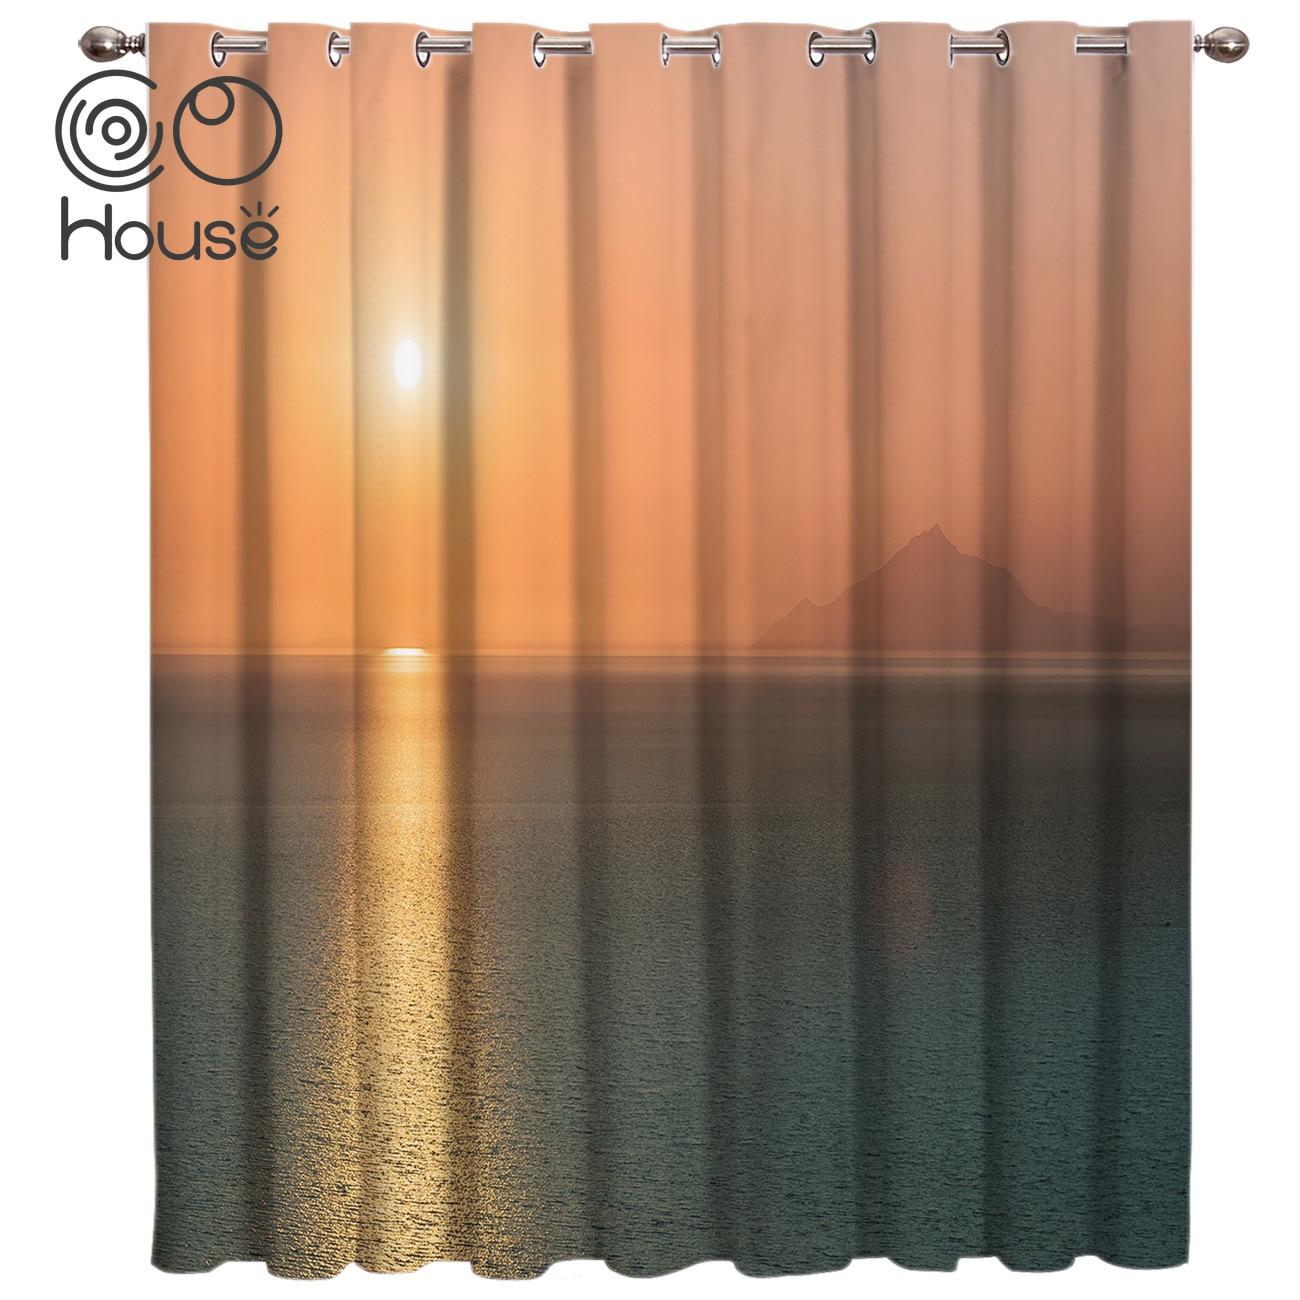 Horizon Sunrise Sunshine Window Treatments Curtains Valance Curtain Rod Bathroom Blackout Curtains Outdoor Kitchen